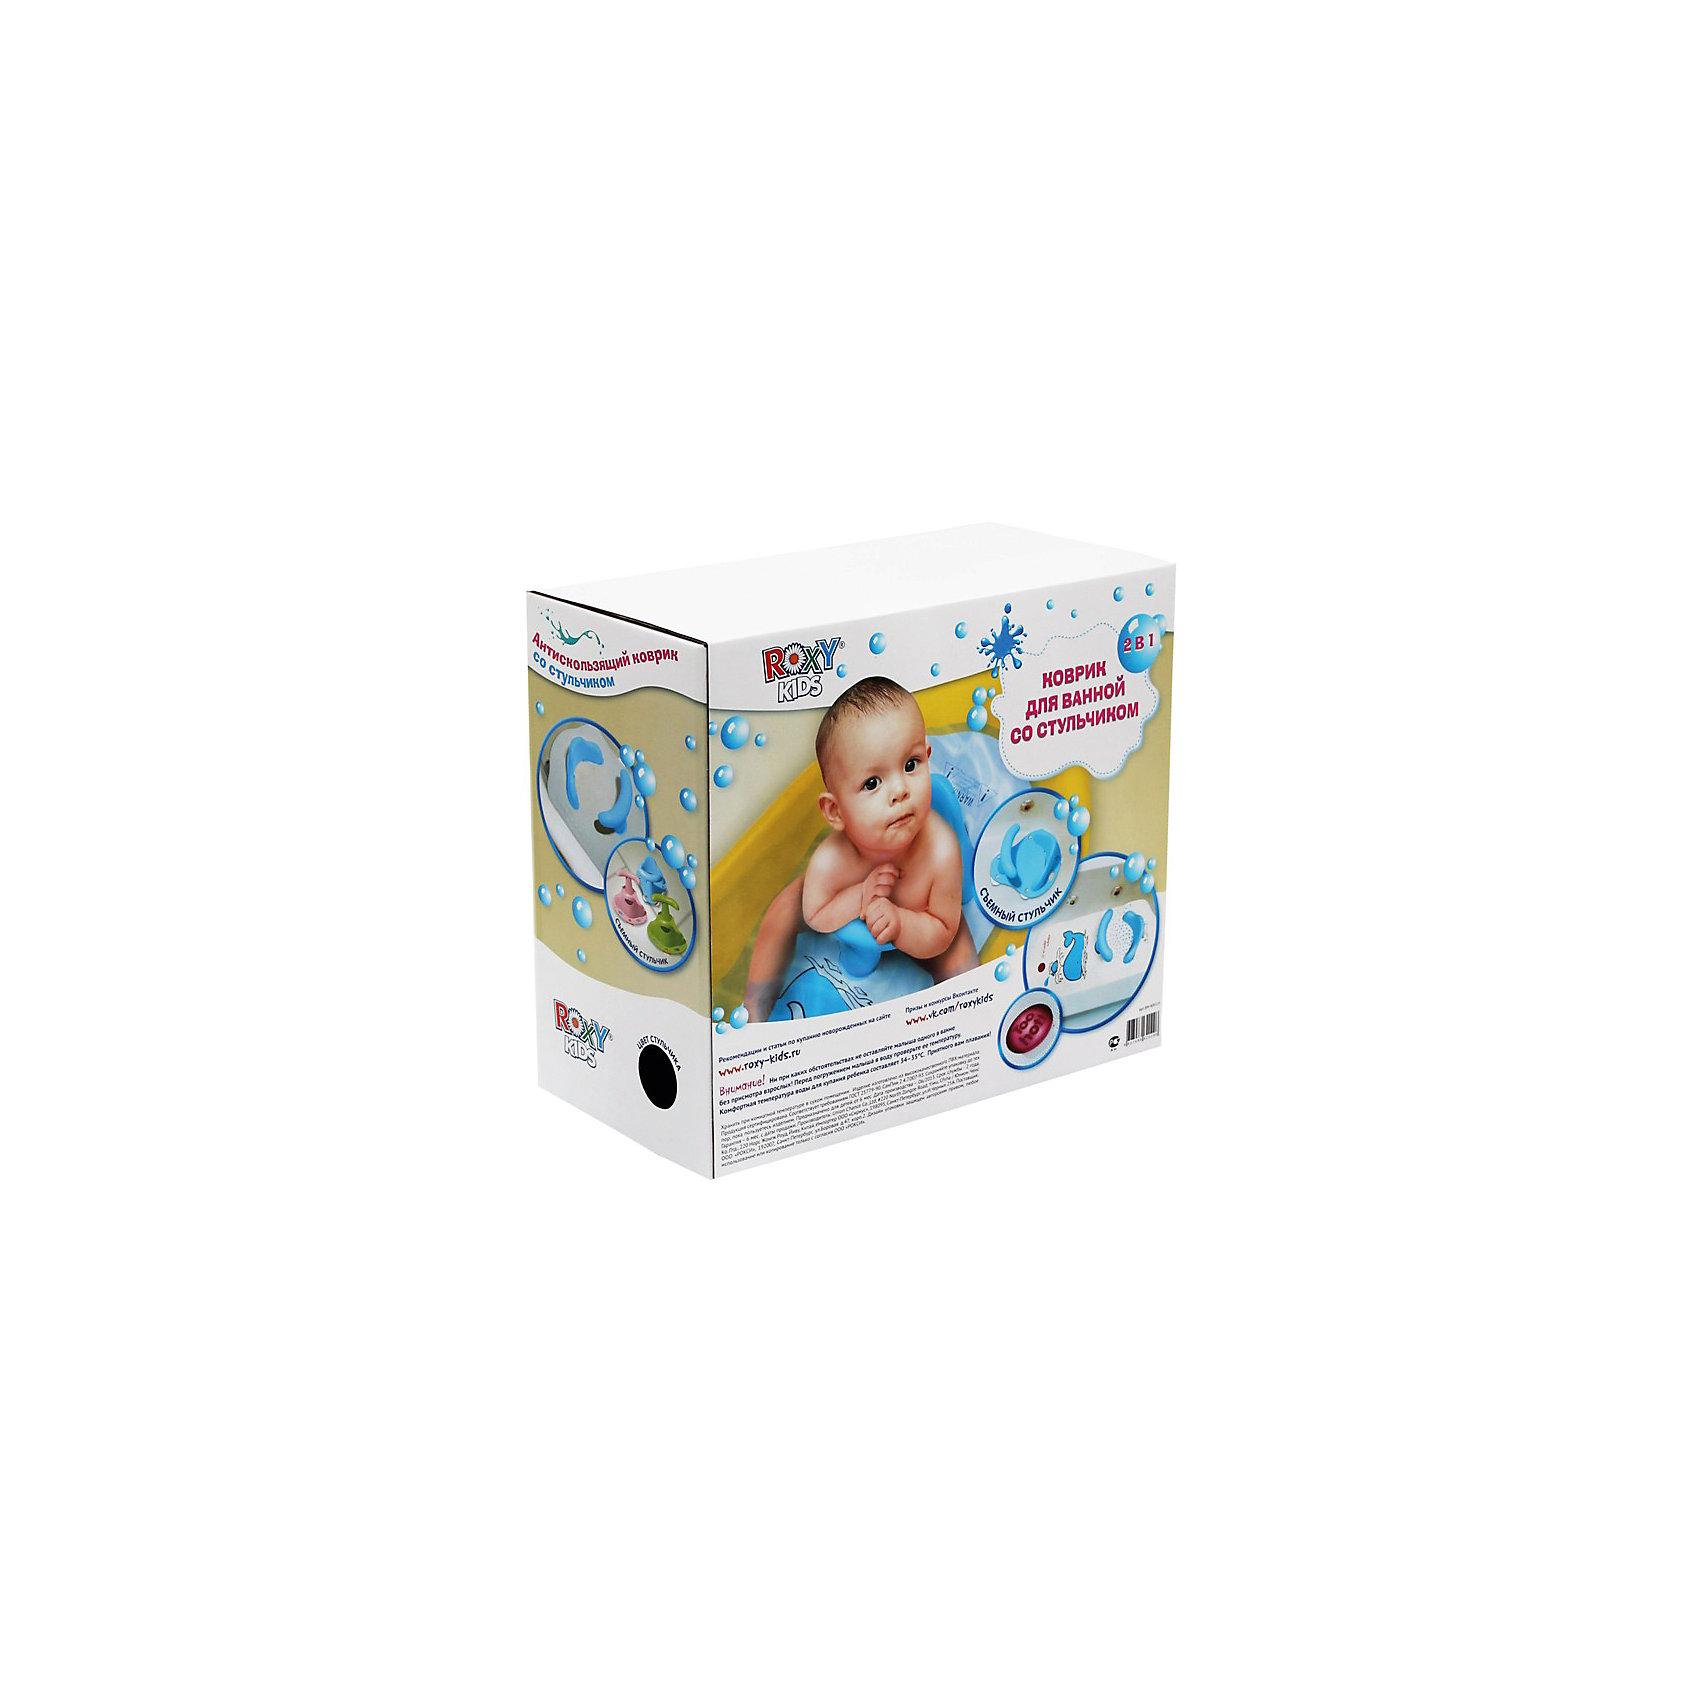 Коврик для ванной со съемным стульчиком ROXY-KIDS, Рыбка (Roxy-Kids)